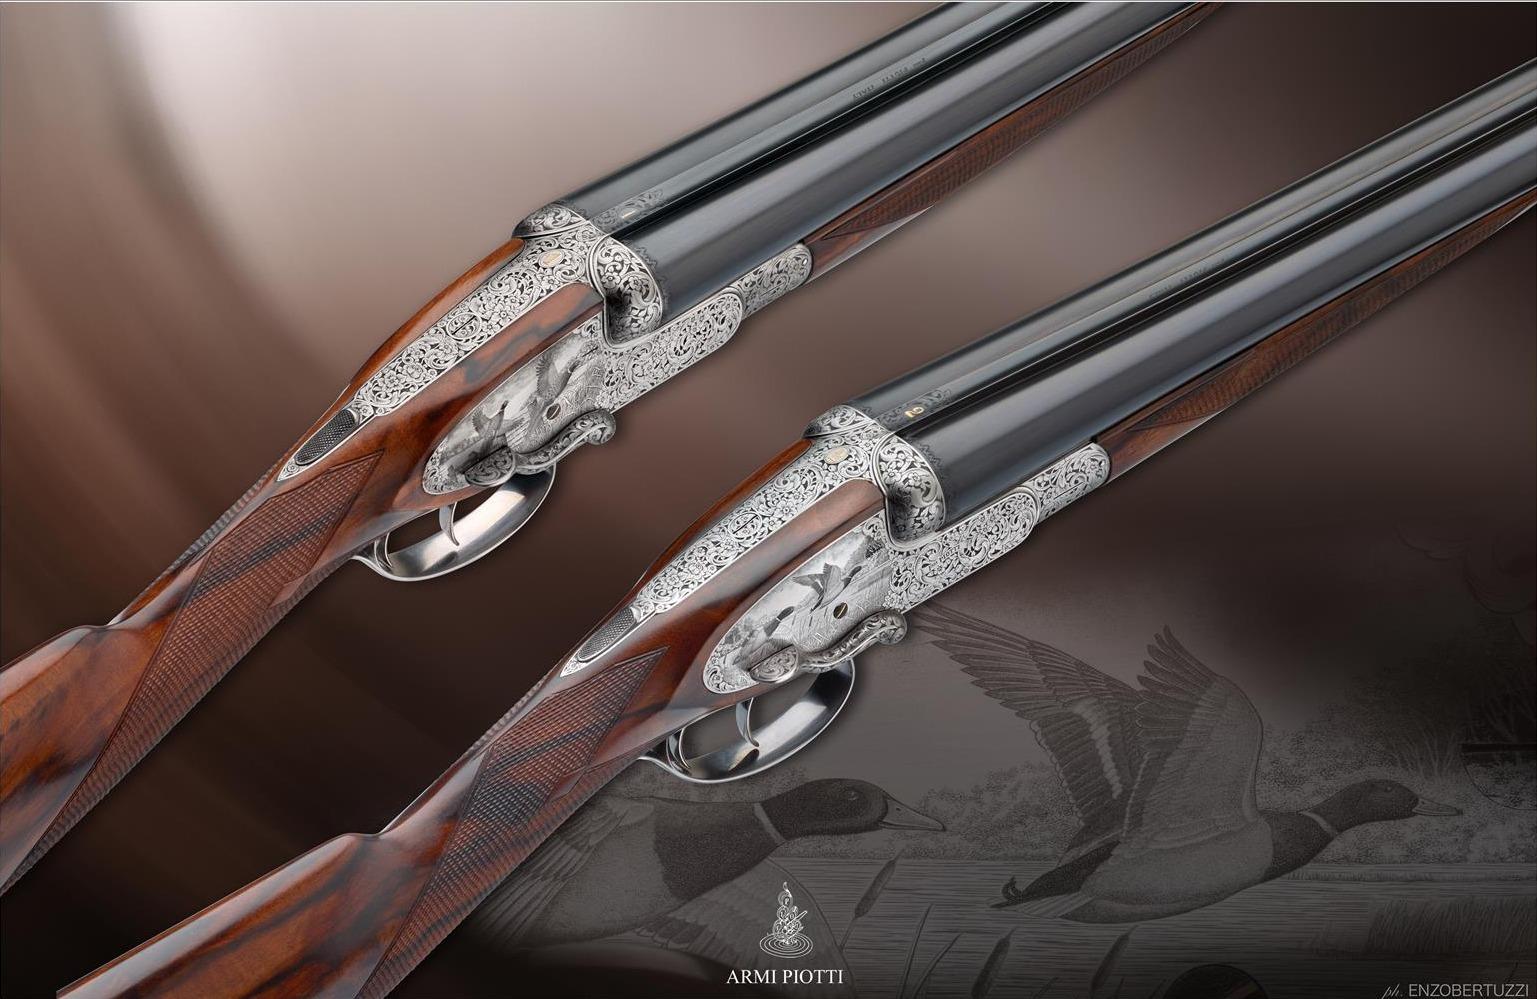 Piotti Sidelever shotgun